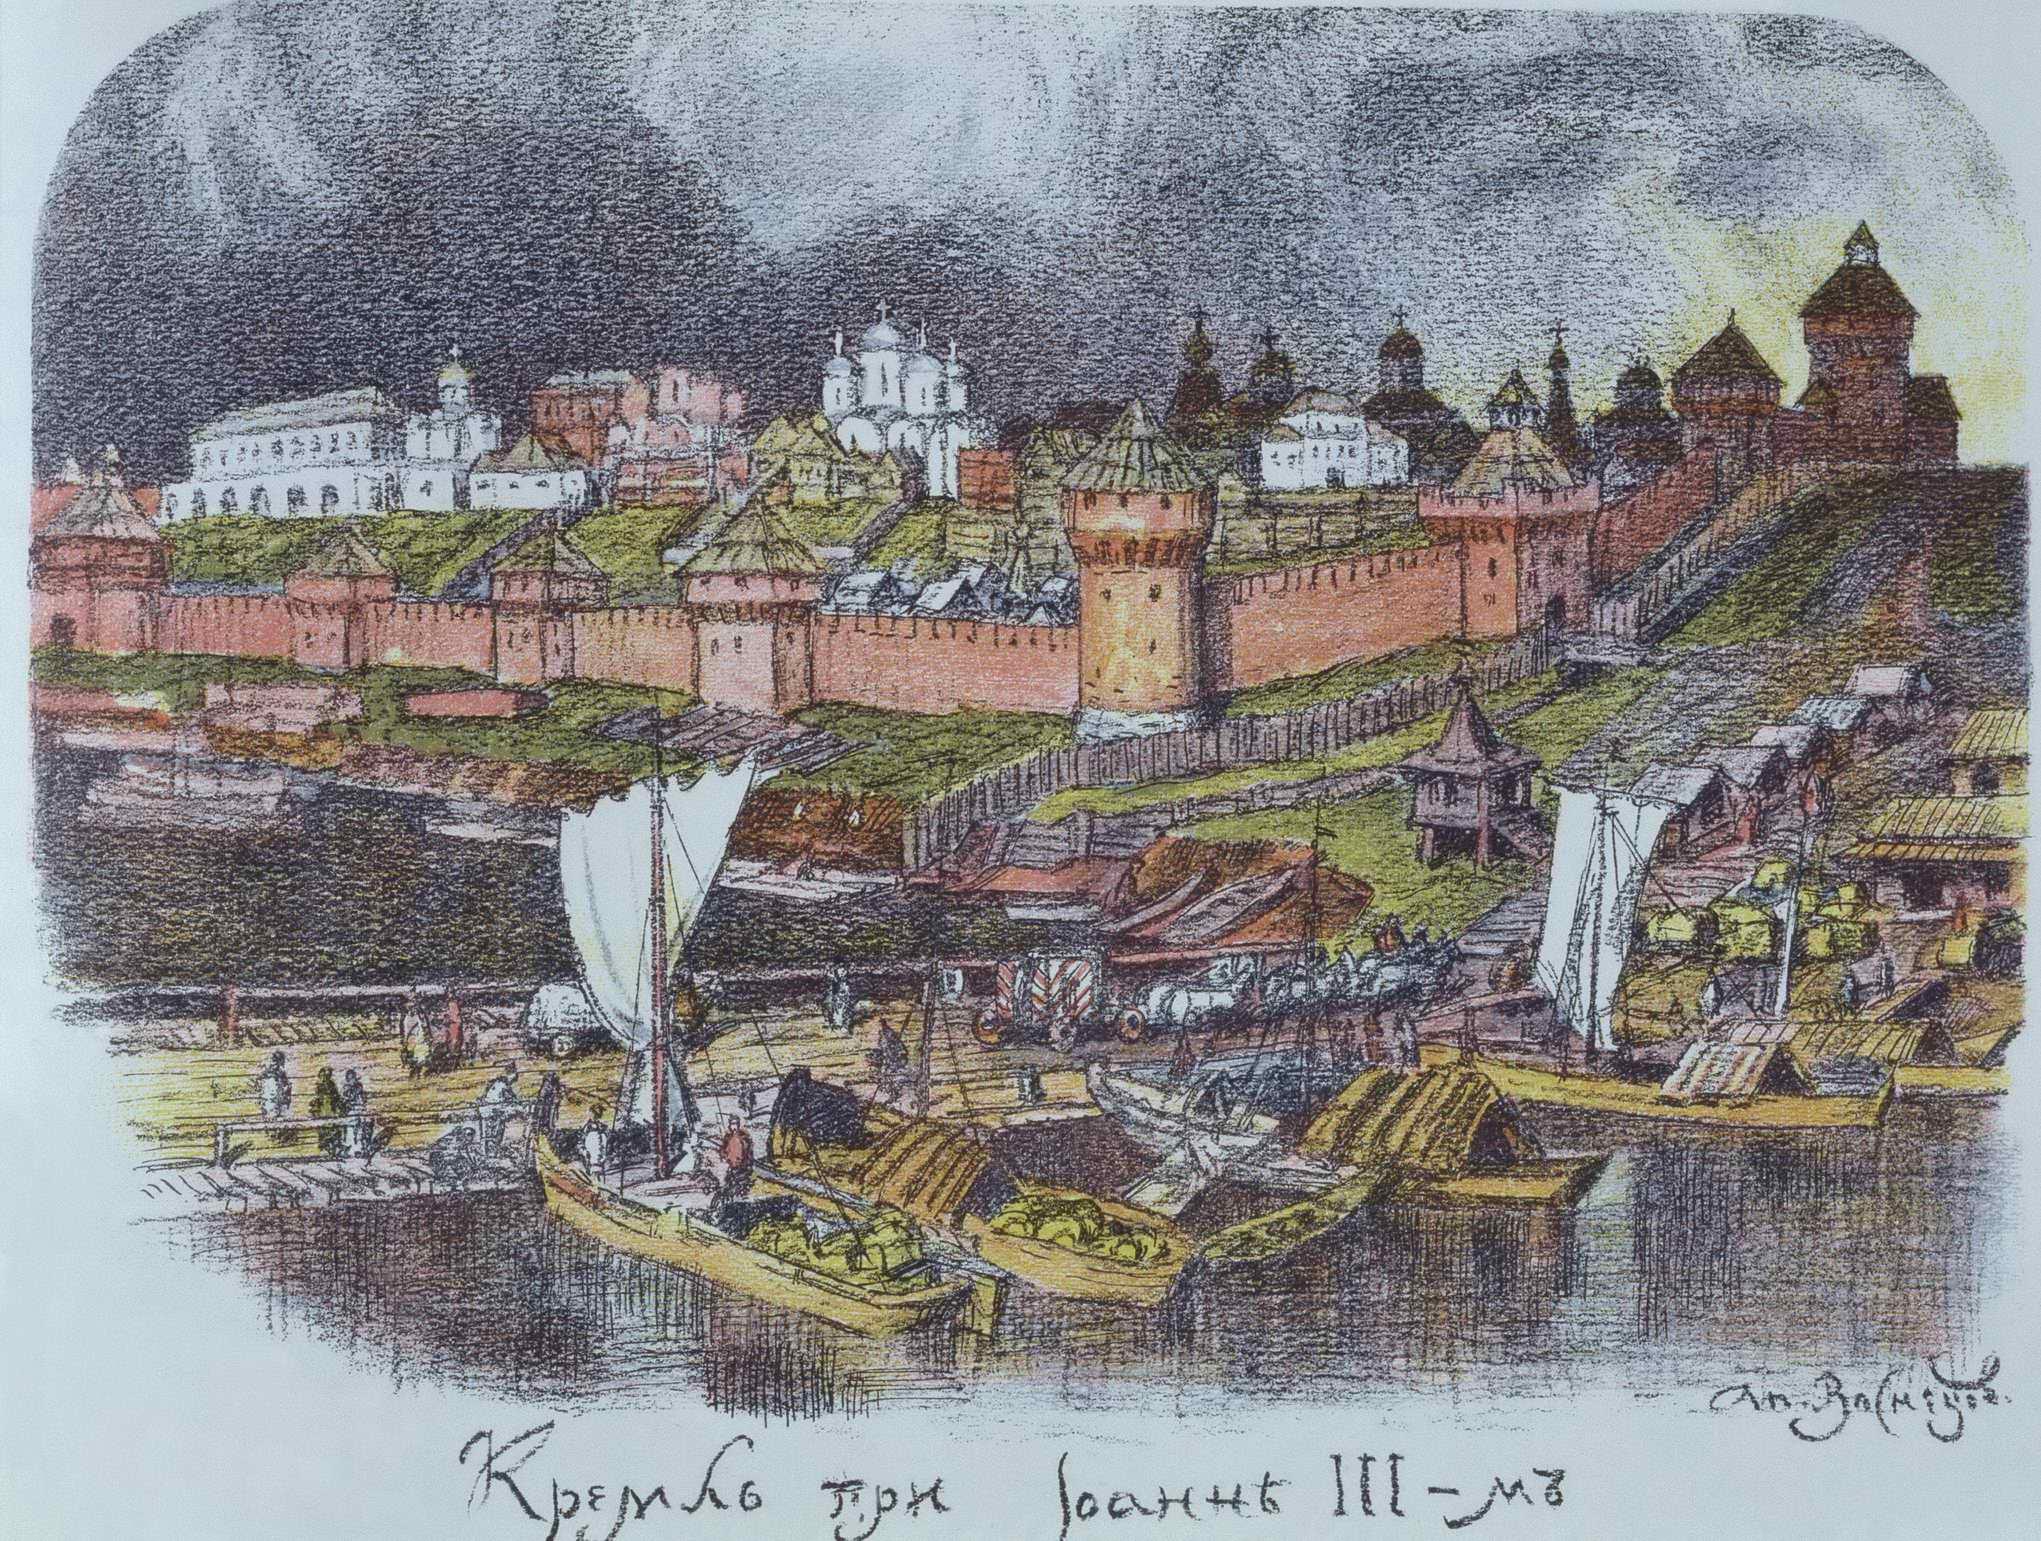 Васнецов А.М. - Кремль при Иване III